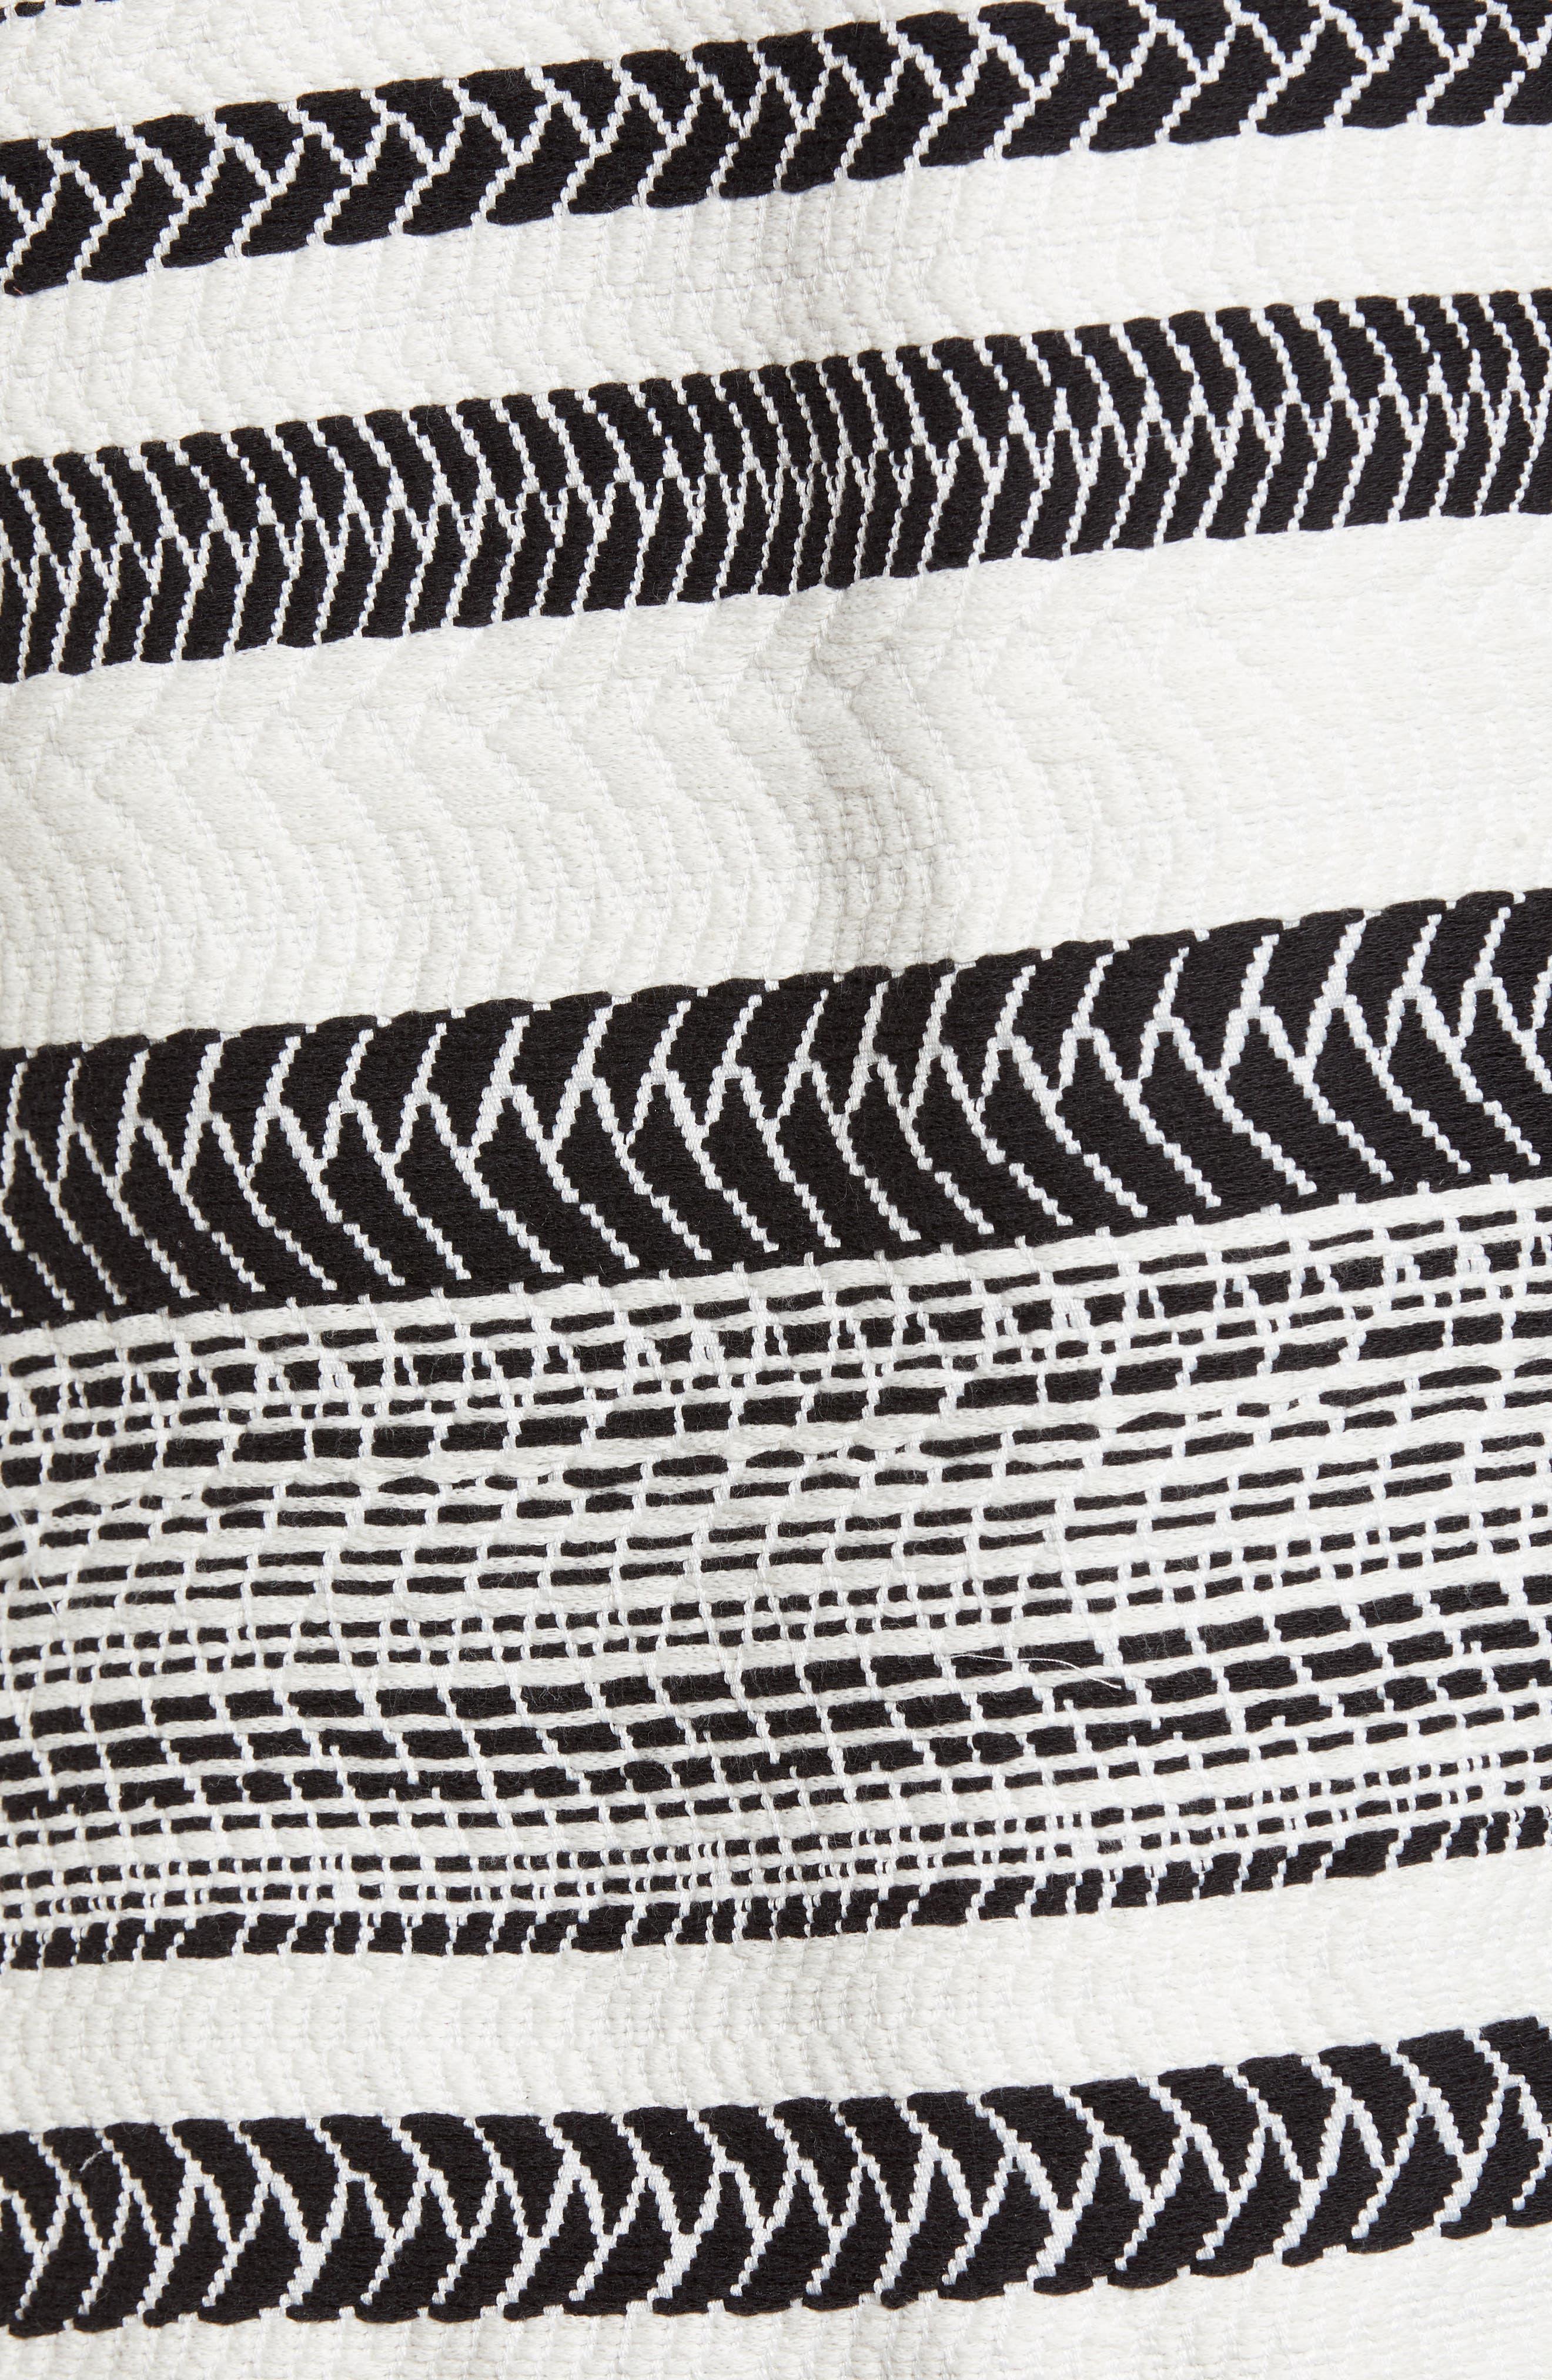 Patterned Cotton Blend Topper,                             Alternate thumbnail 6, color,                             Black- Ivory Herringbone